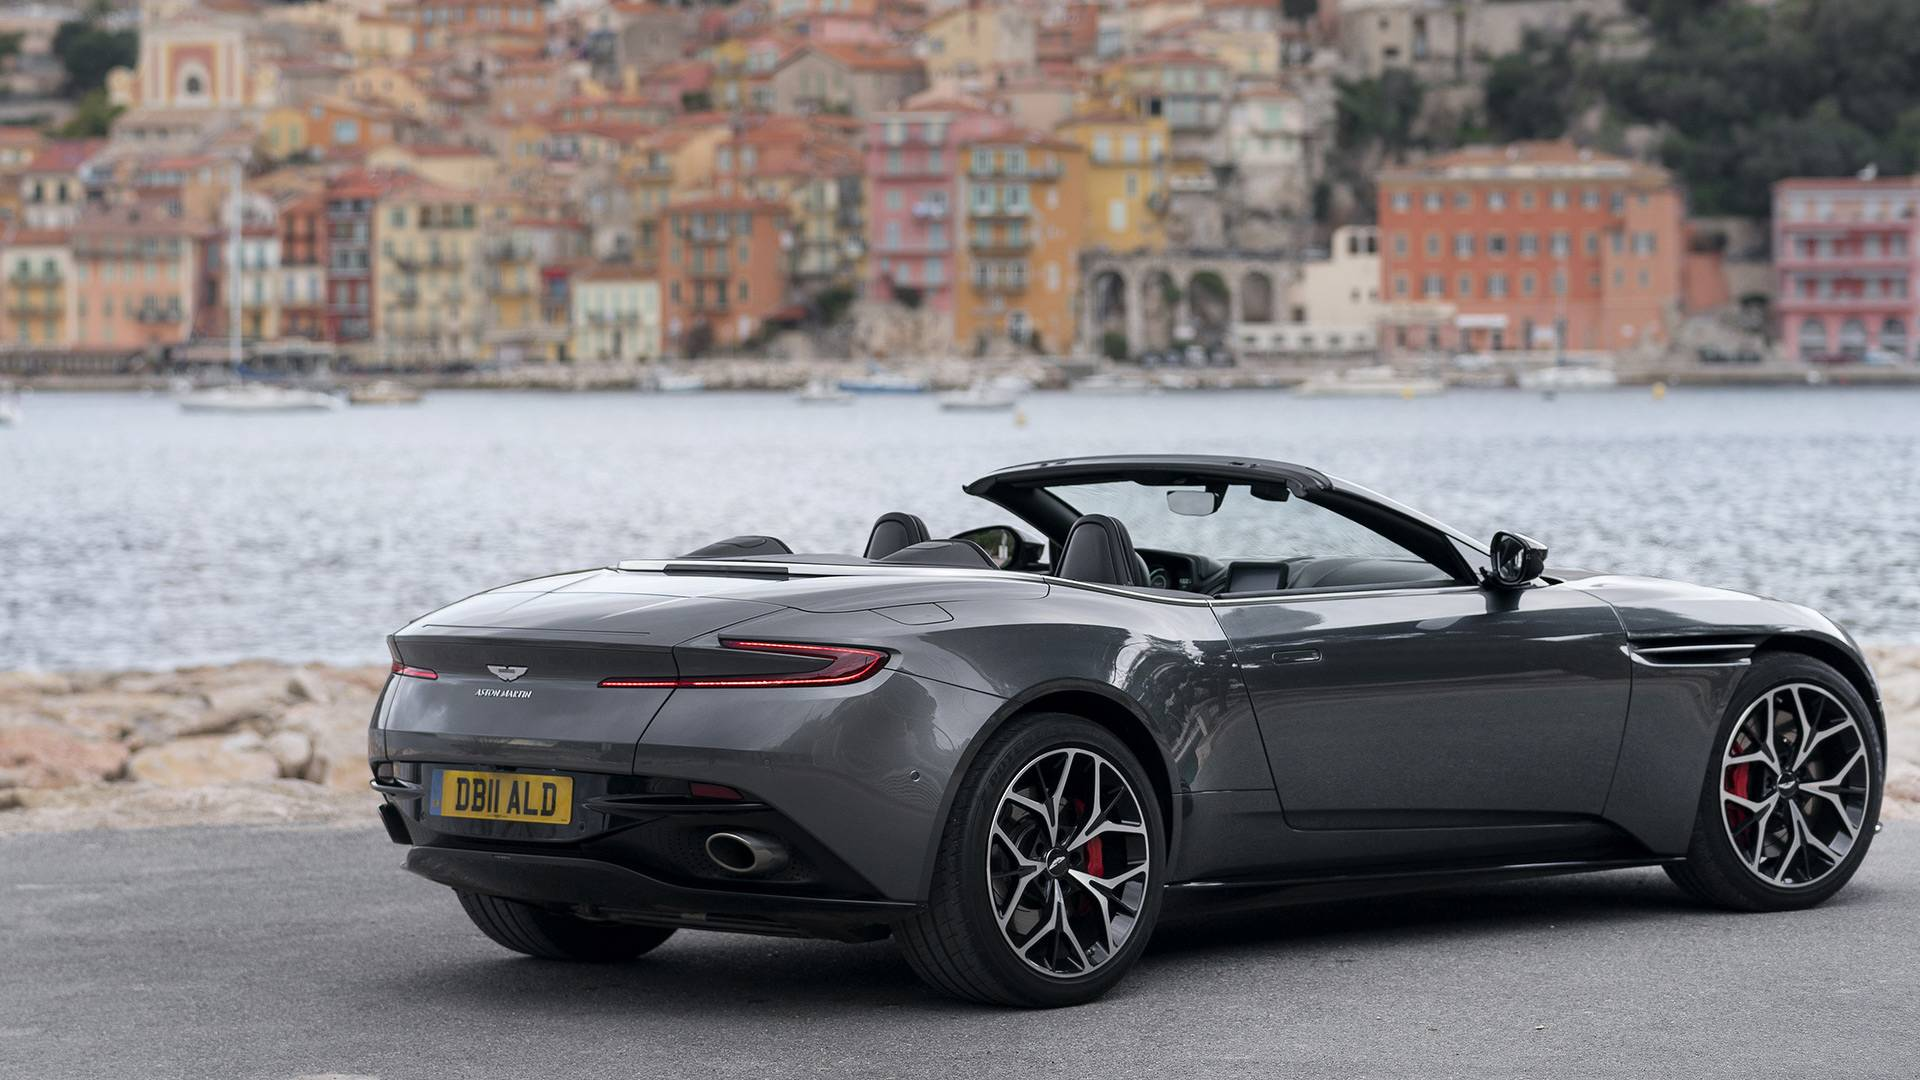 2019 Aston Martin Db11 Volante First Drive Lost And Found